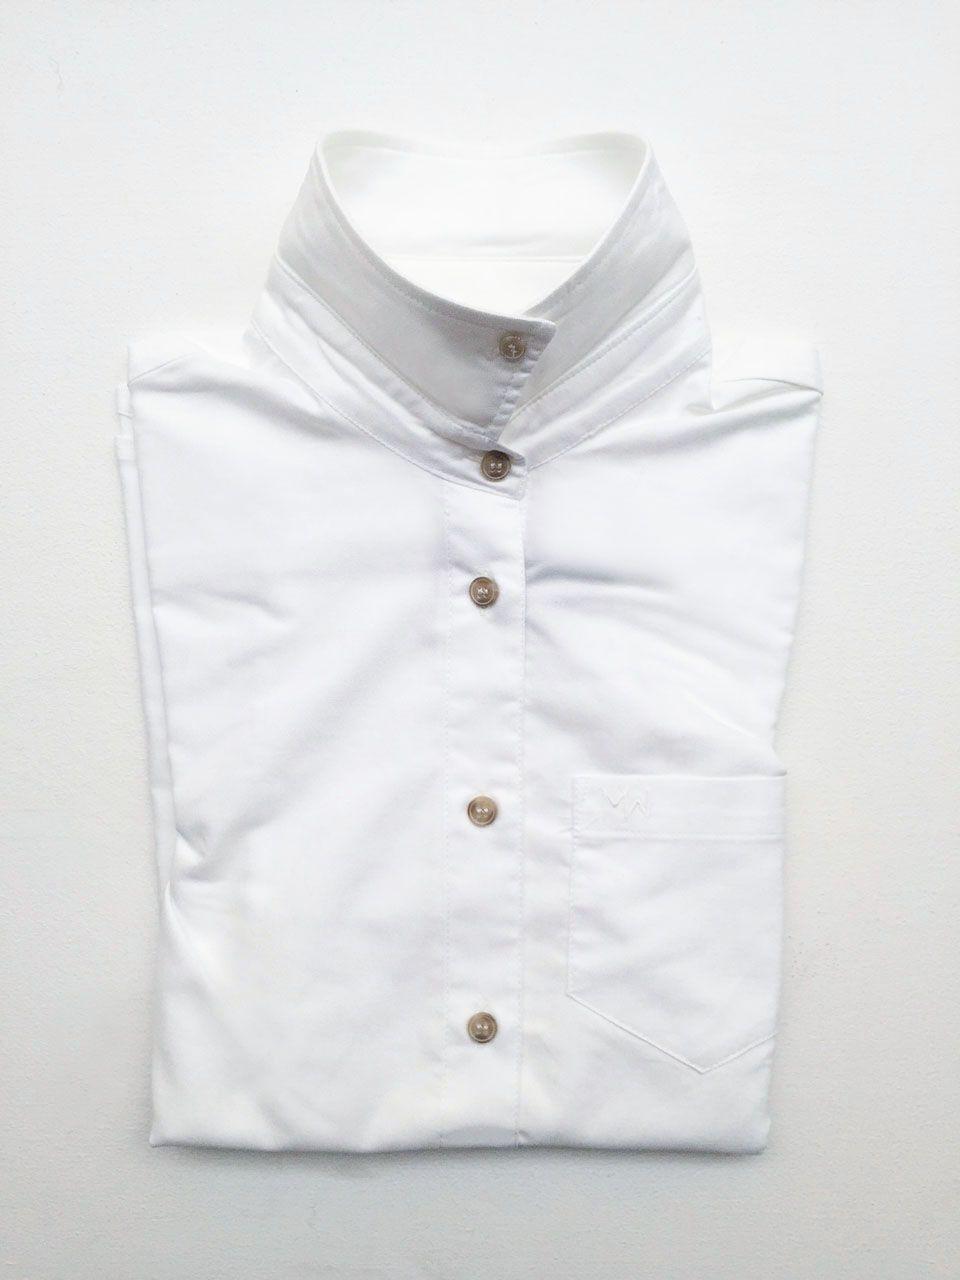 Agnes Oxford Shirt, White via Martha Ridewear. Click on the image to see more!